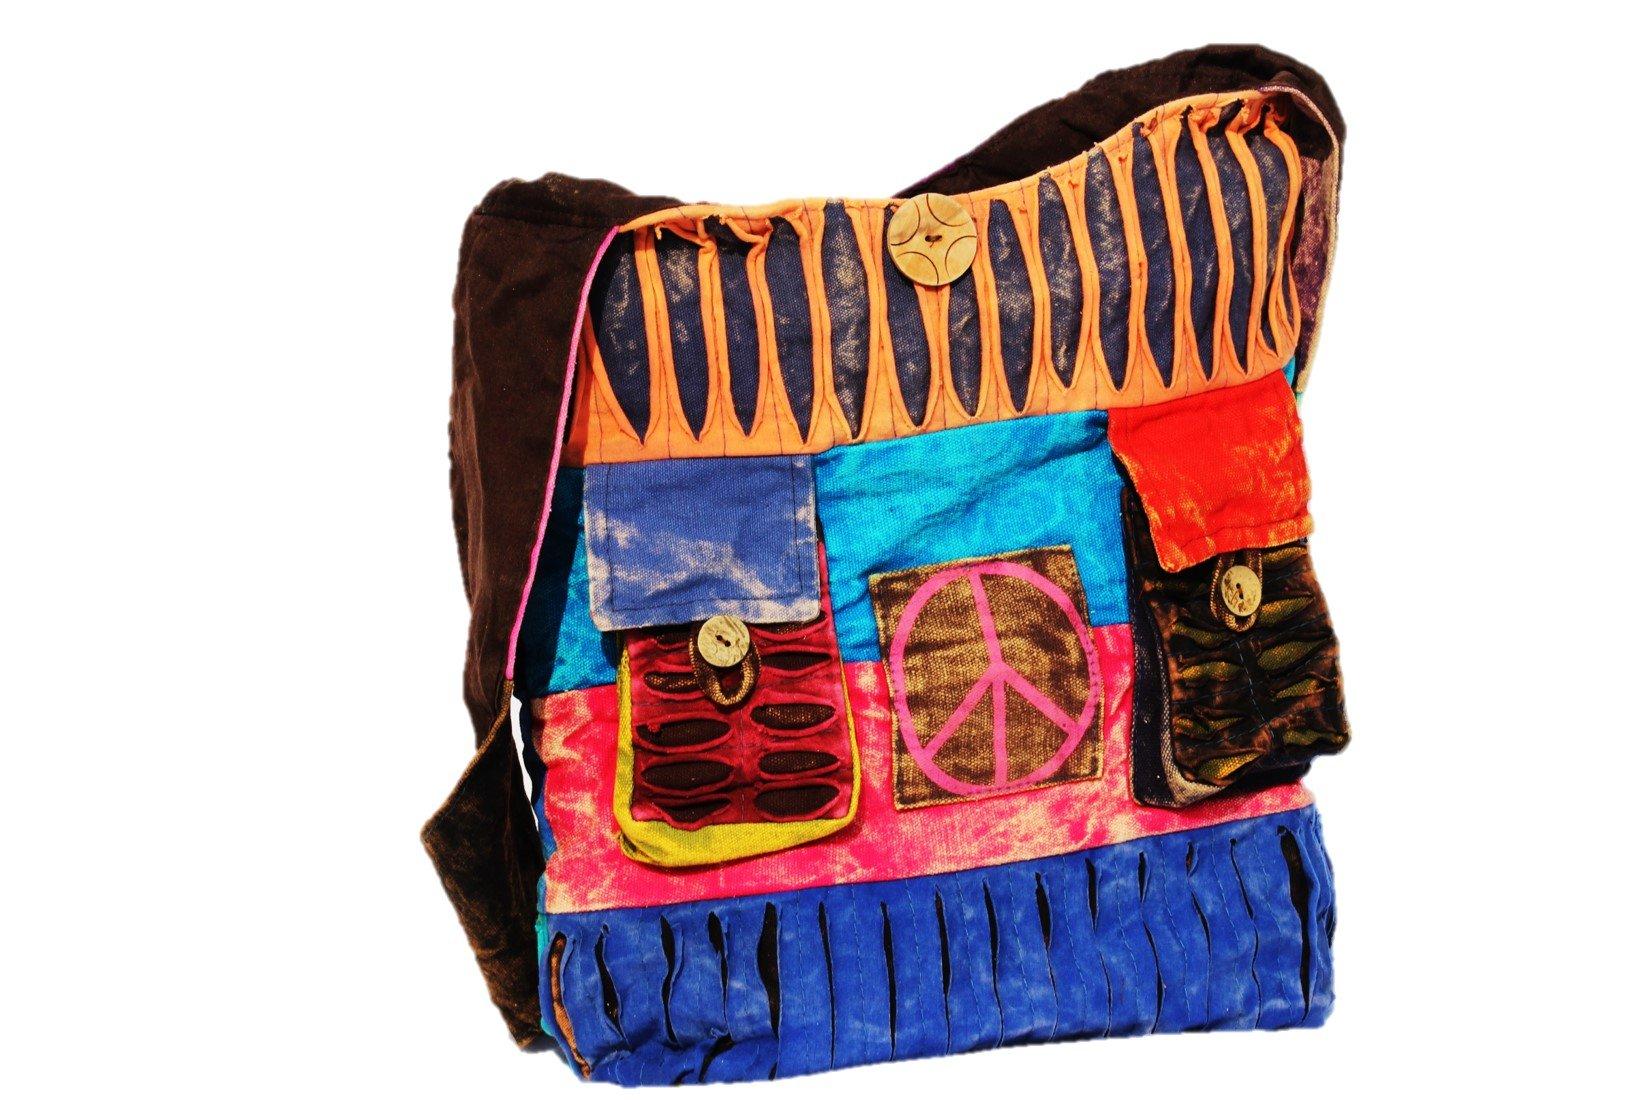 TRIBESMAN-Blue Red Hobo Cotton Sling Cross Body Messenger Shoulder Bag Hippie Boho Bohemian Light Roomy Spacious by TRIBESMANGOLD (Image #1)